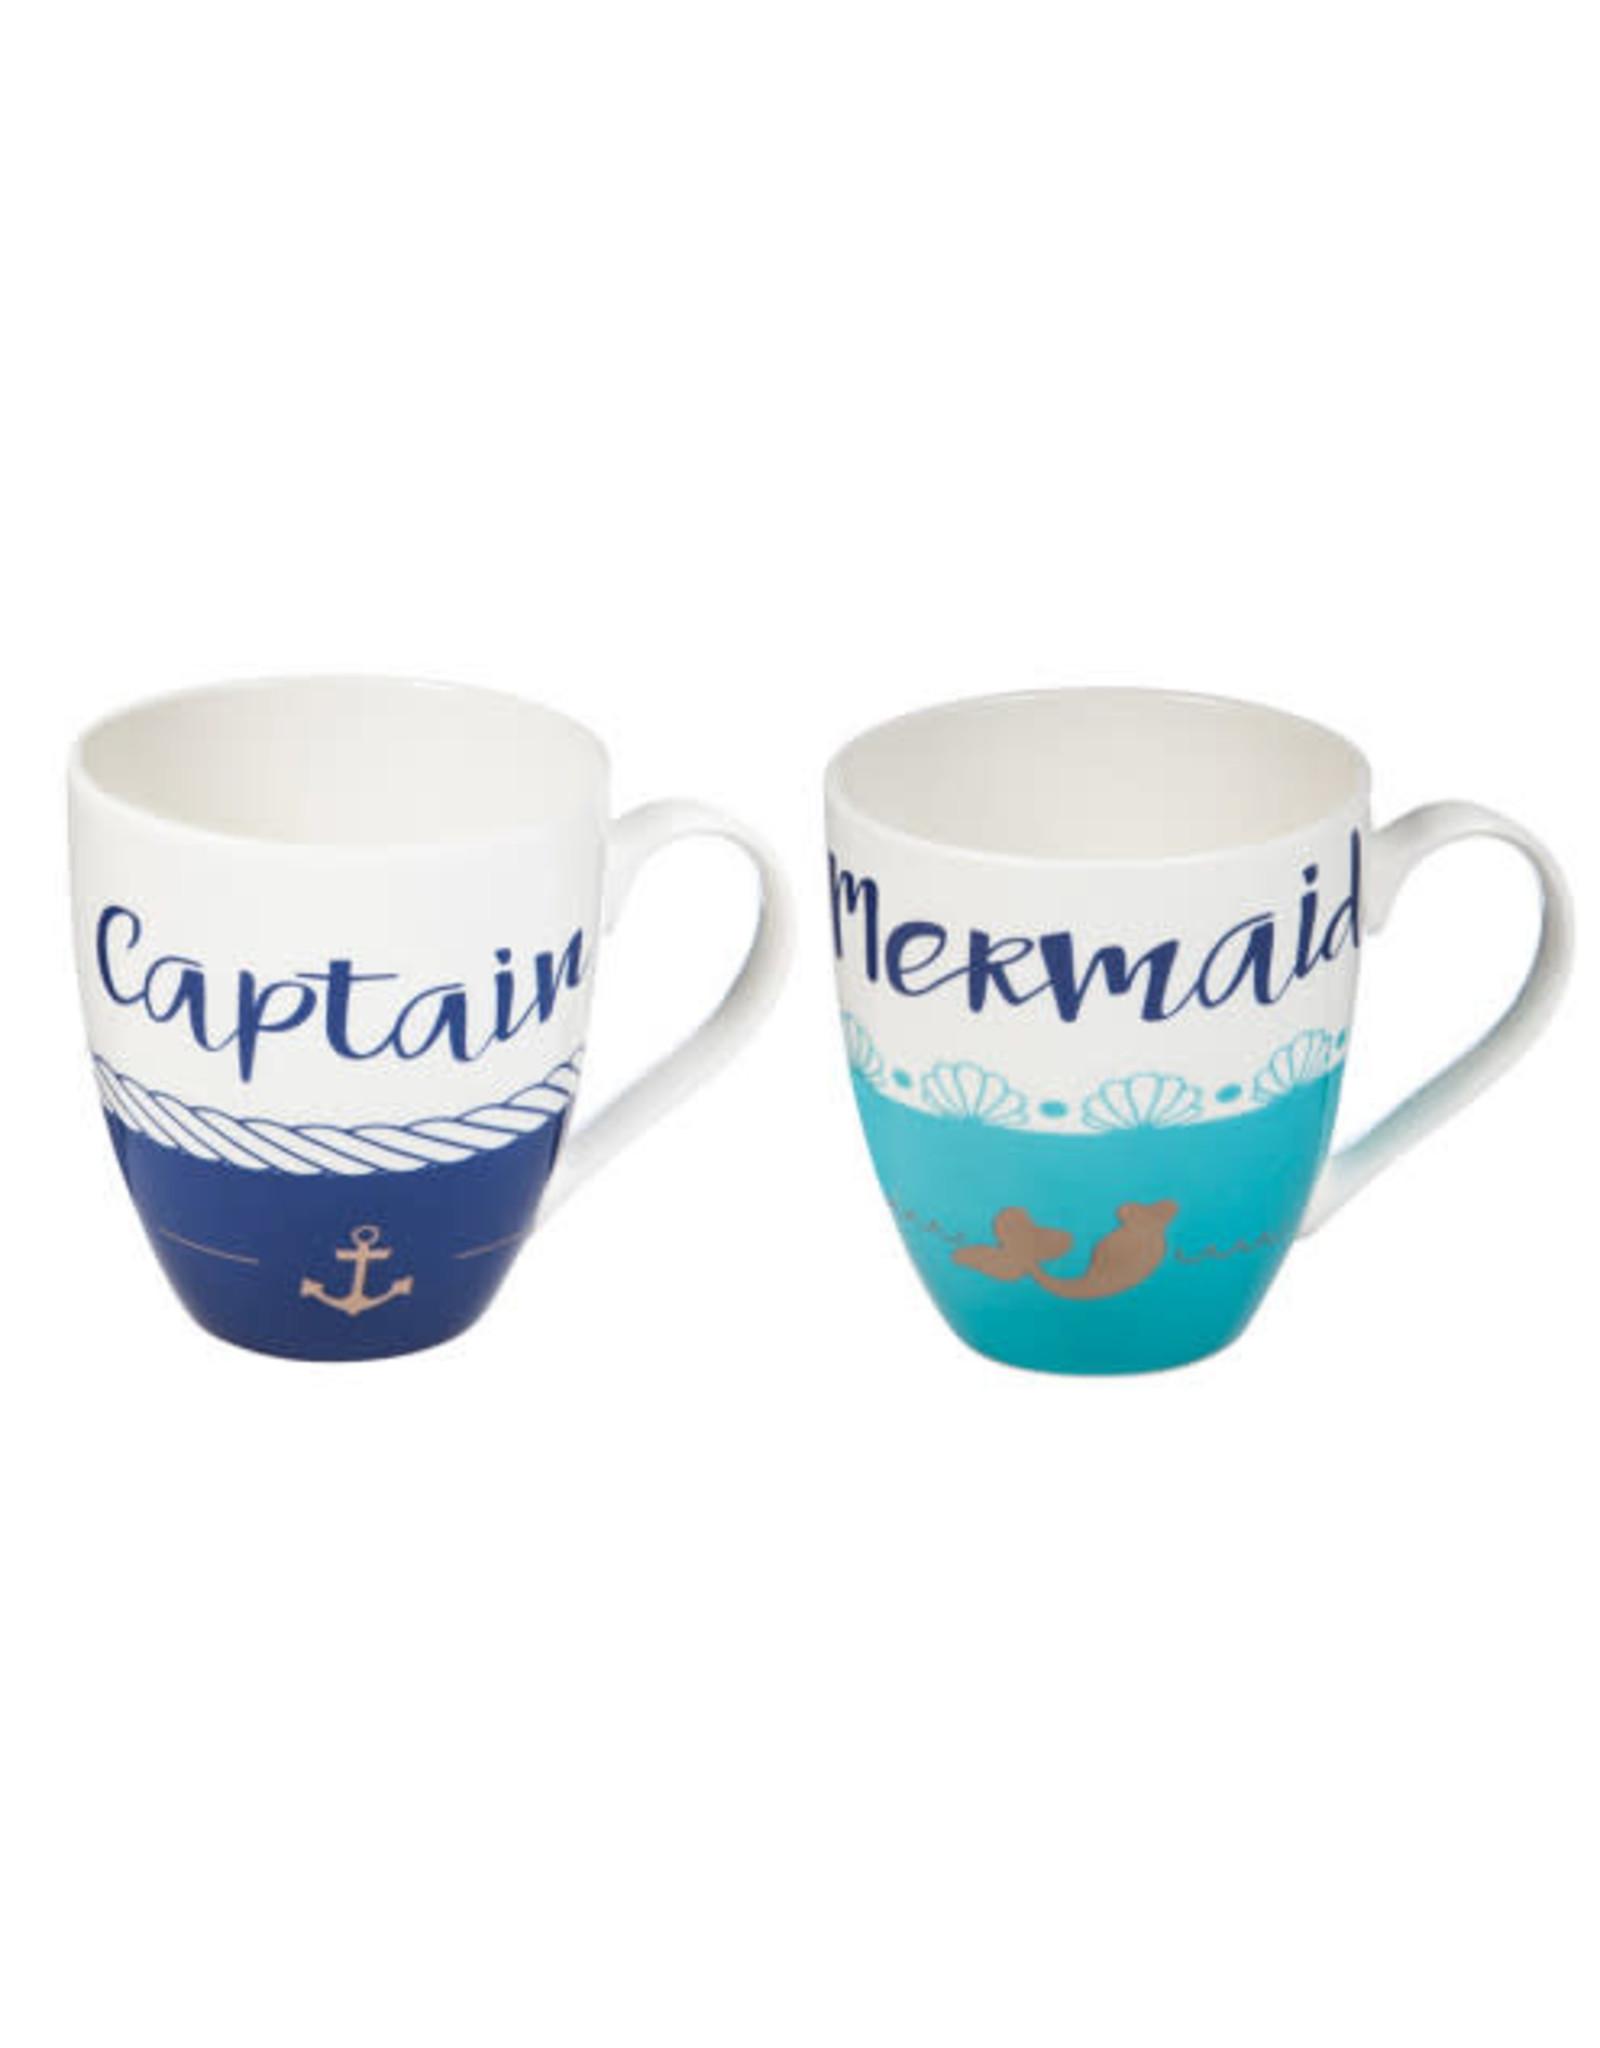 Captain & Mermaid Cup set 3MCF006